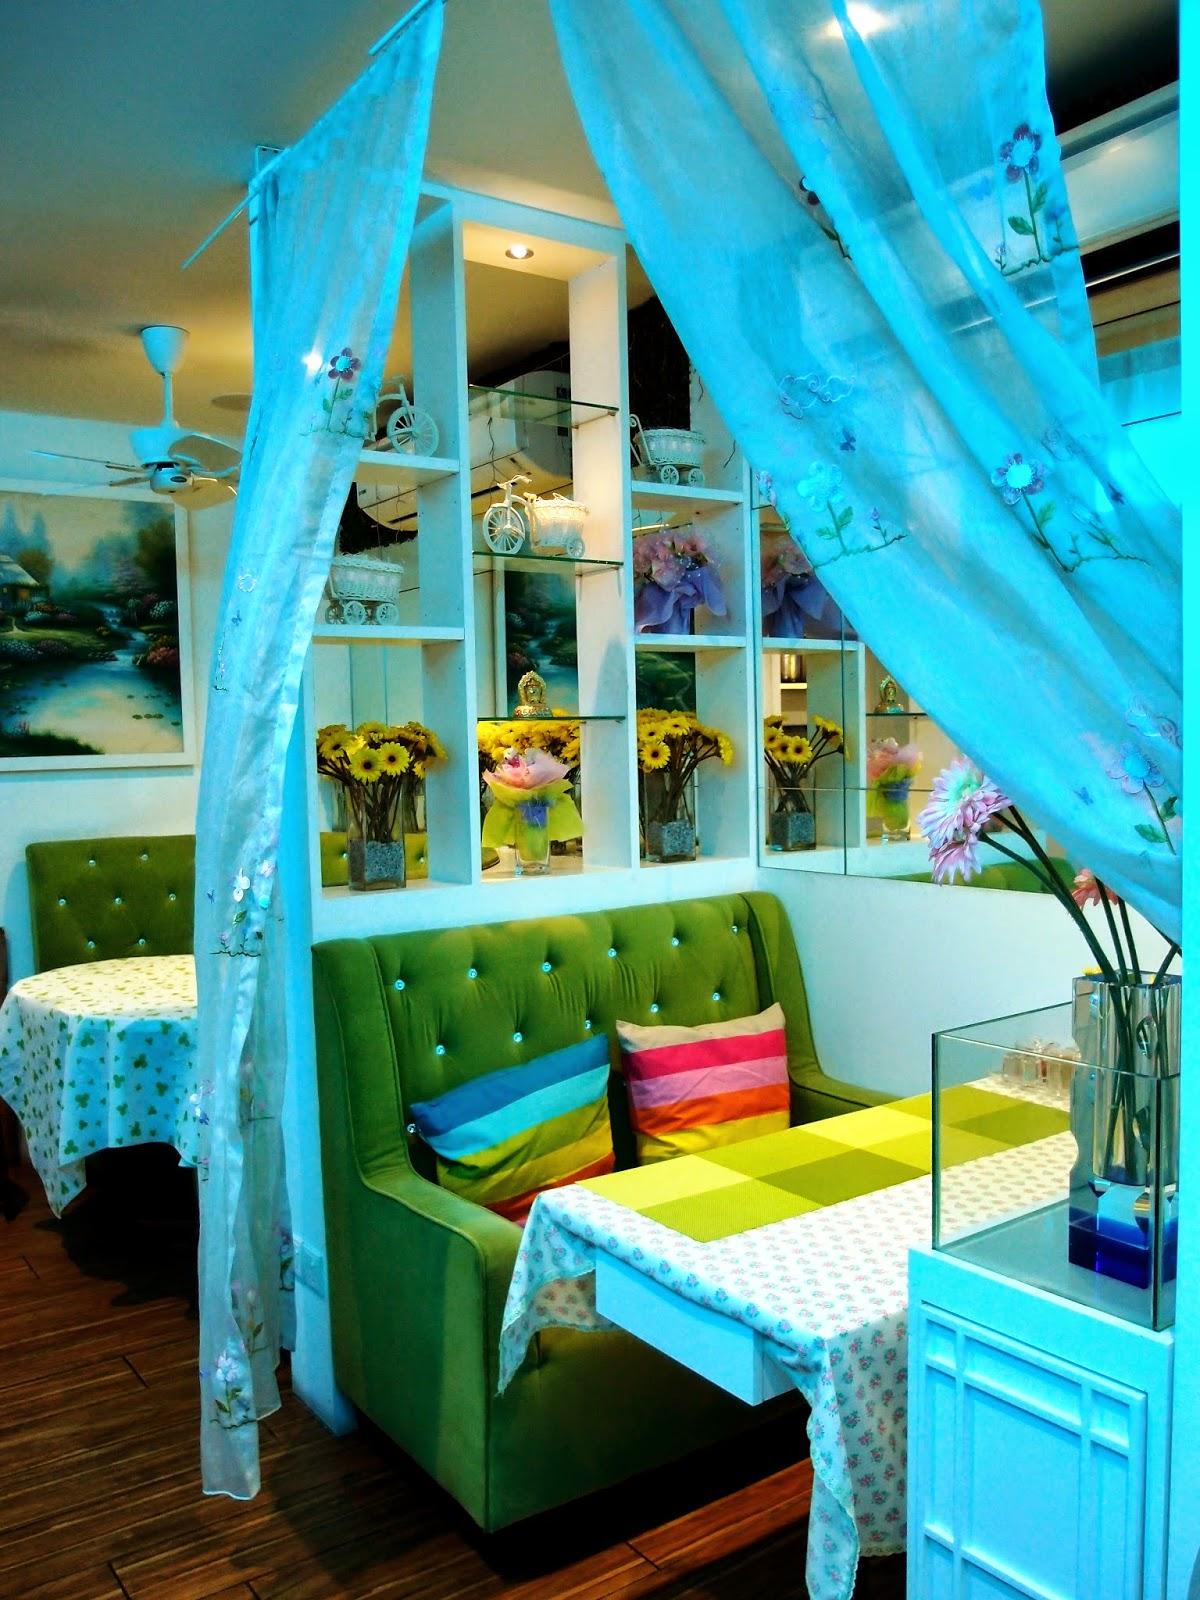 Follow Me To Eat La - Malaysian Food Blog: You & Me Kitchen Corner ...